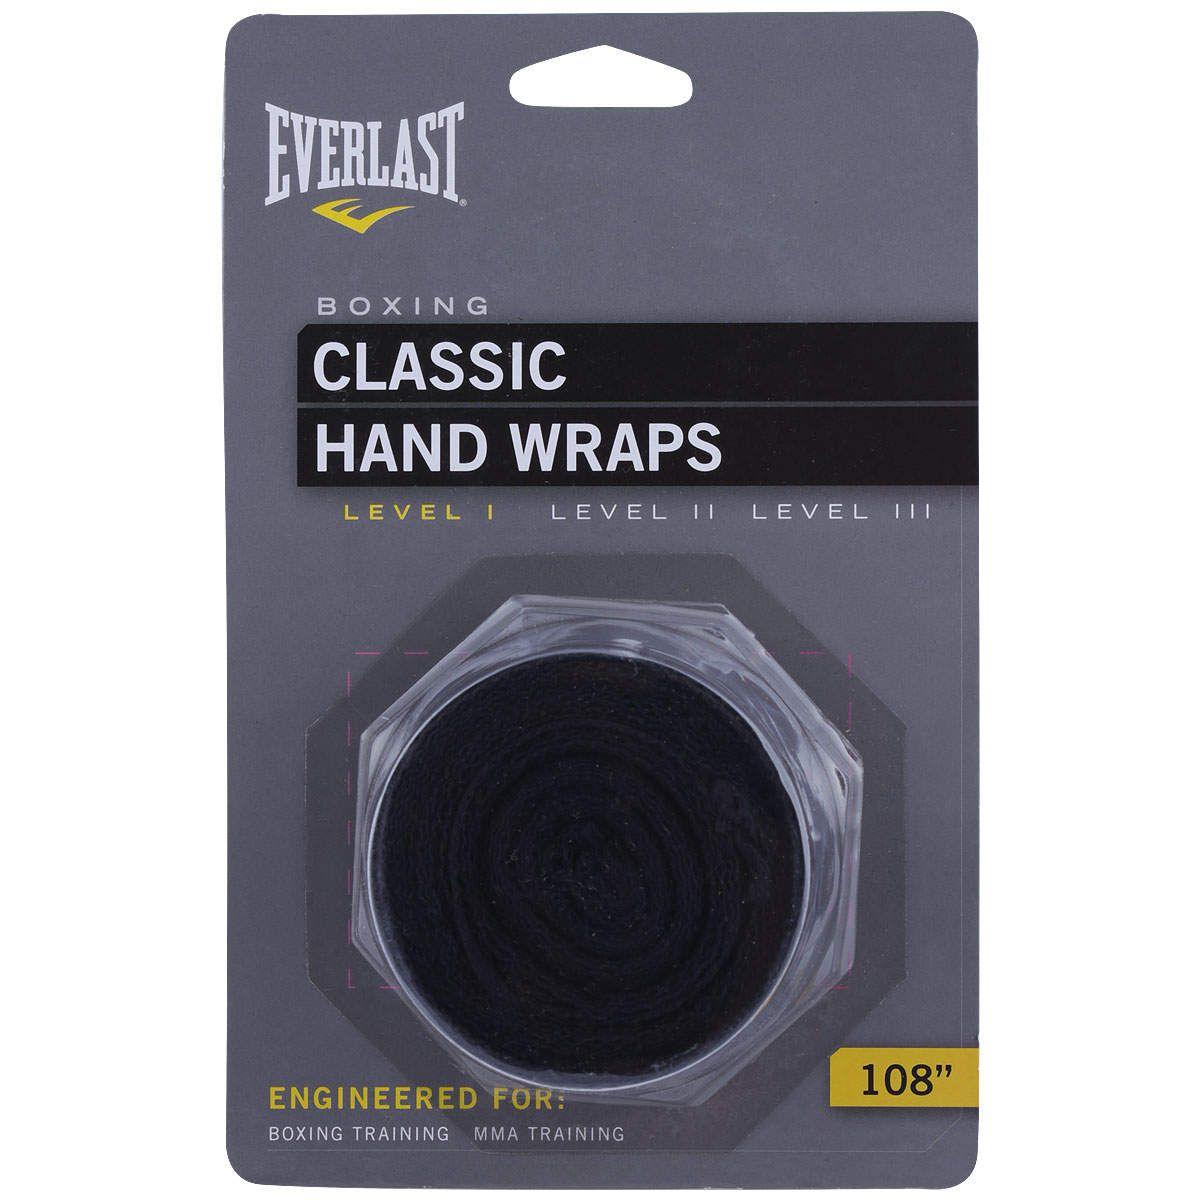 Kit  Everlast Bandagem 108 inches Preta Protetor Bucal Simples Branco Luva Elite Pro Style 12oz Prateada